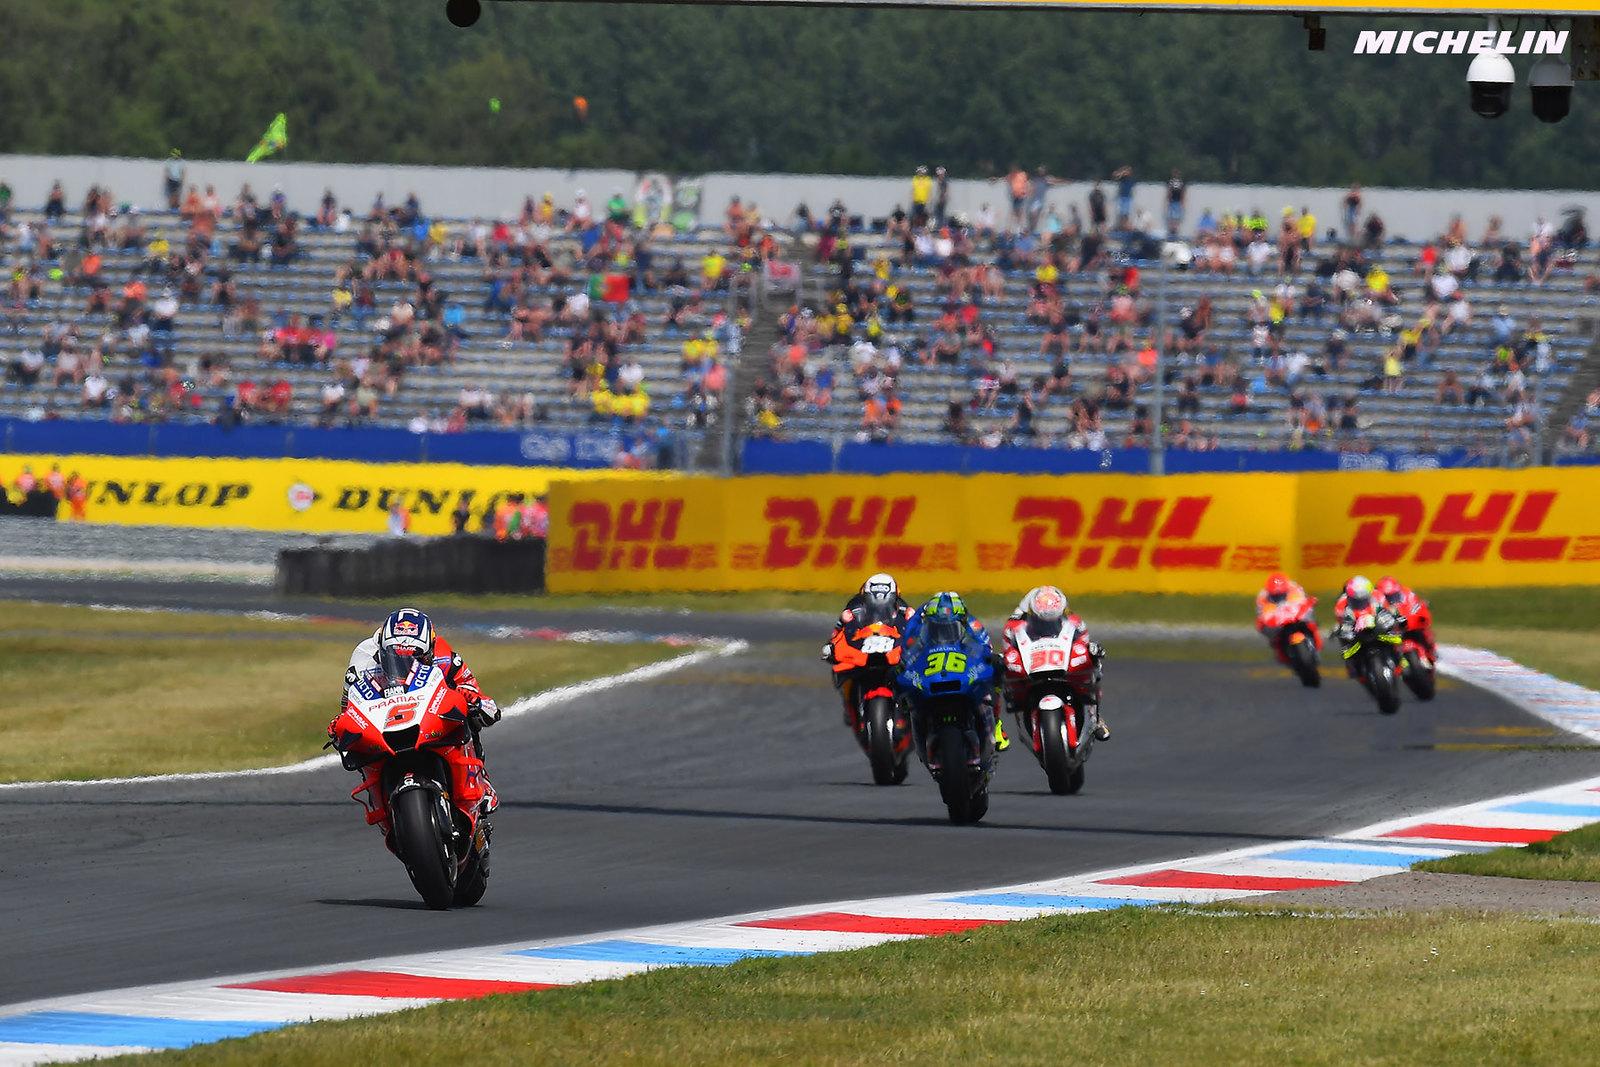 MotoGP2021オランダGP 9位中上 貴晶「オーストリアの2戦が楽しみ」